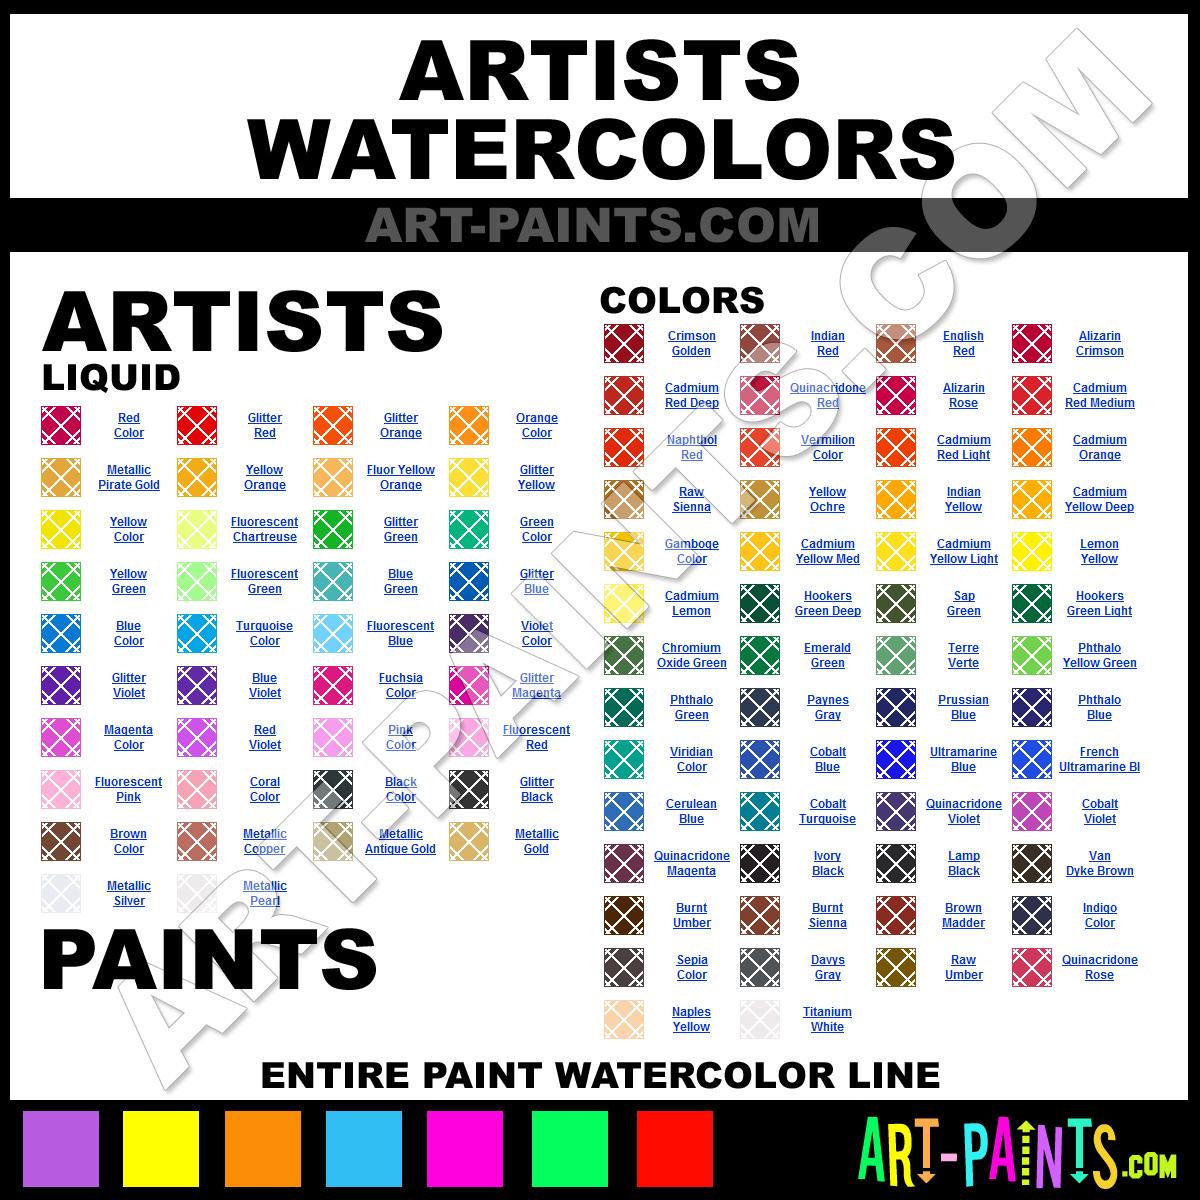 Paint Colors And Brands: Artists Watercolor Paint Brands